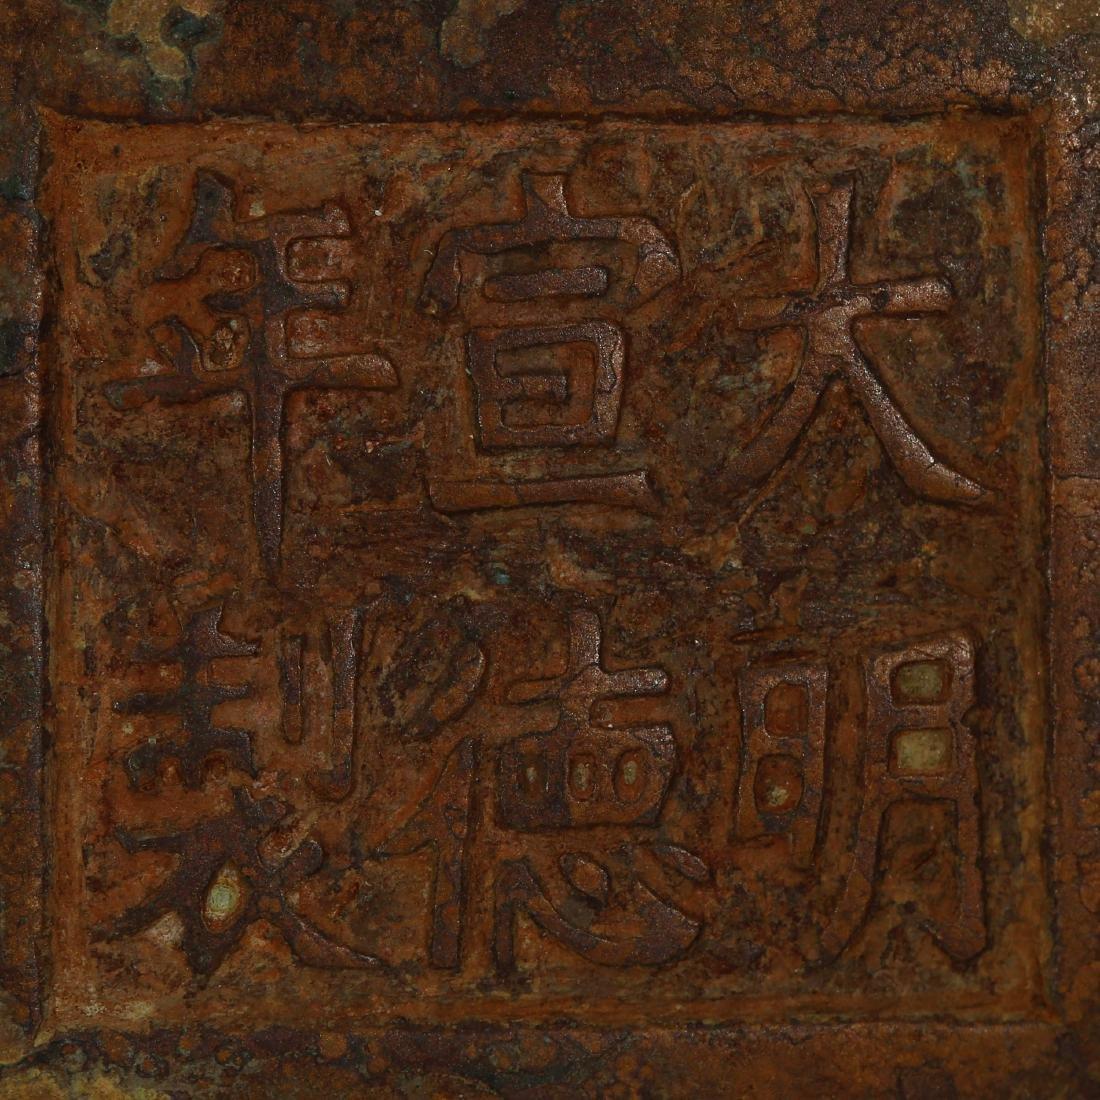 CHINESE BRONZE CENSER WITH MARK - 8